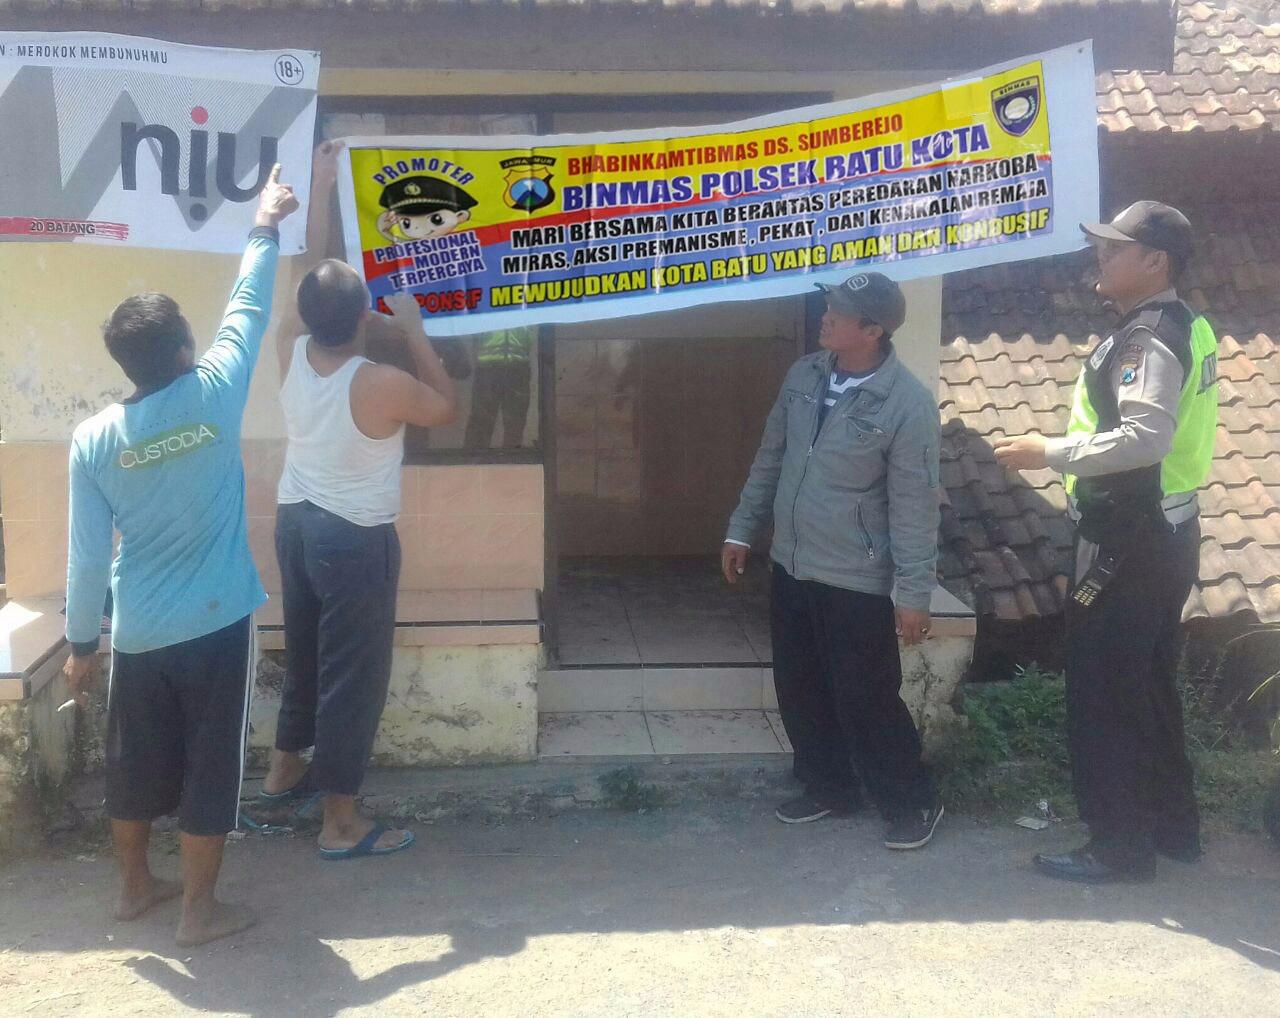 Anggota Bhabinkamtibmas Polsek Batu Polres Batu Melaksanakan Patroli Pemasangan Banner Himbauan Kamtibmas Di Desa Binaan